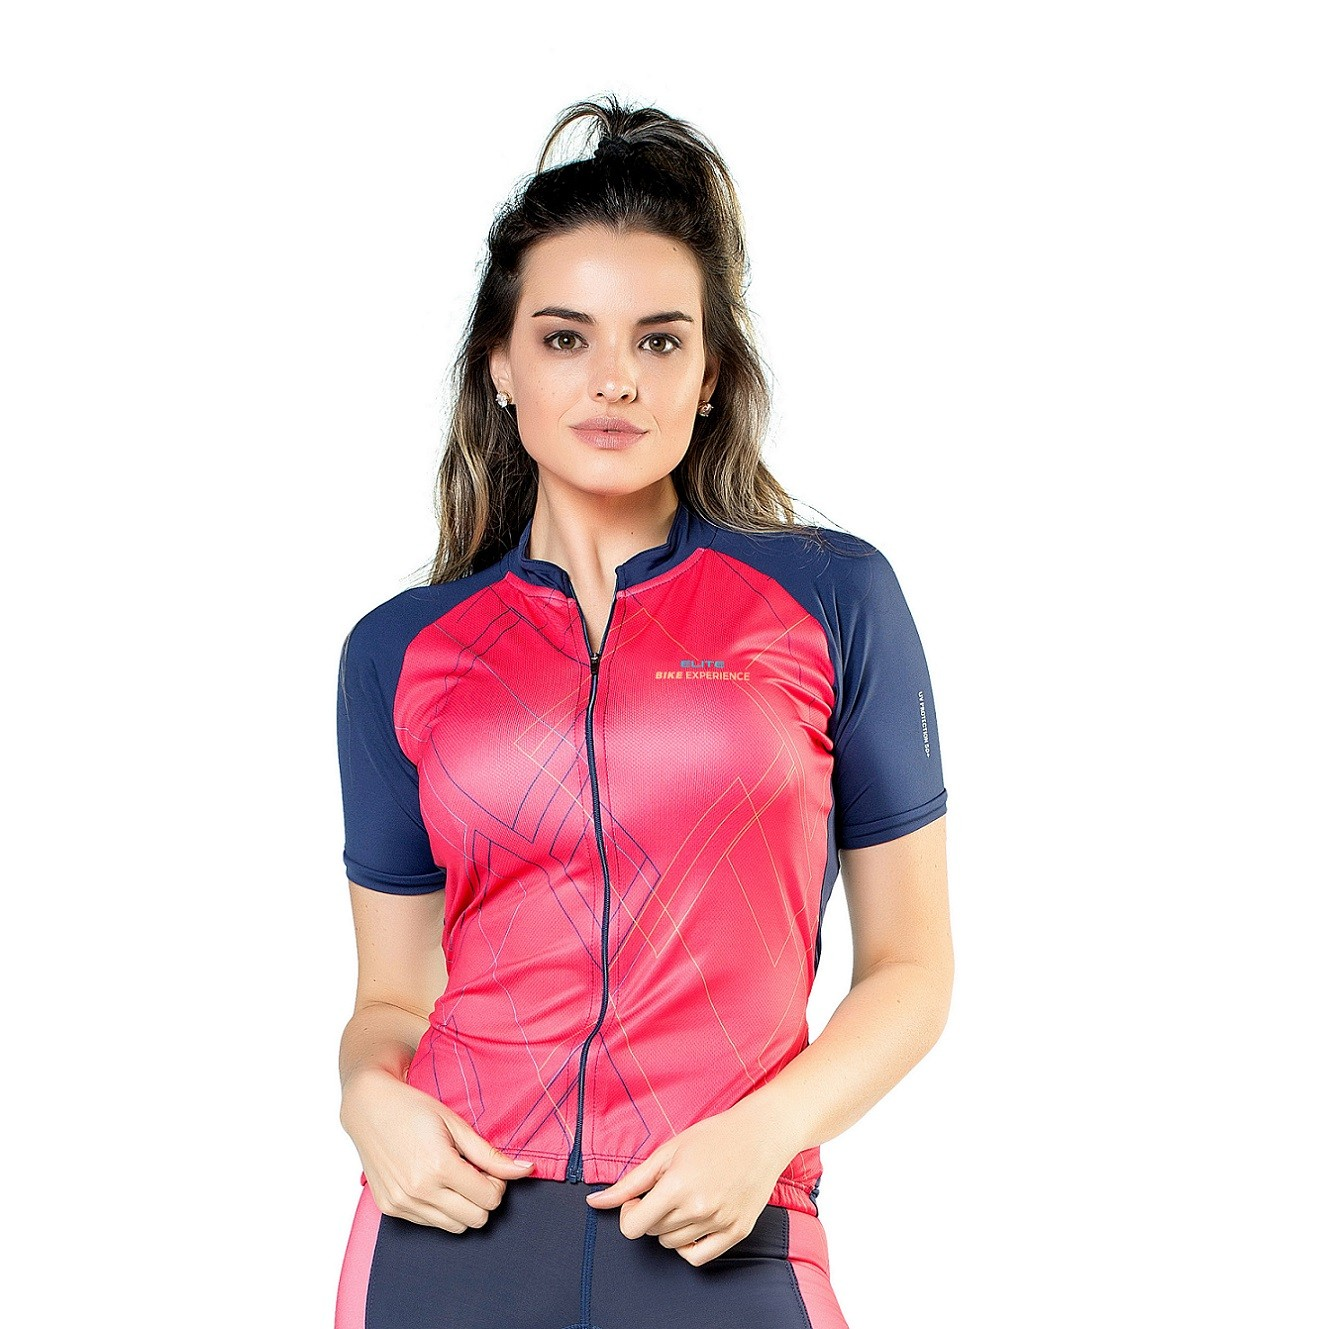 Kit Bike UV 50 + Almeria Whistler Feminino Elite